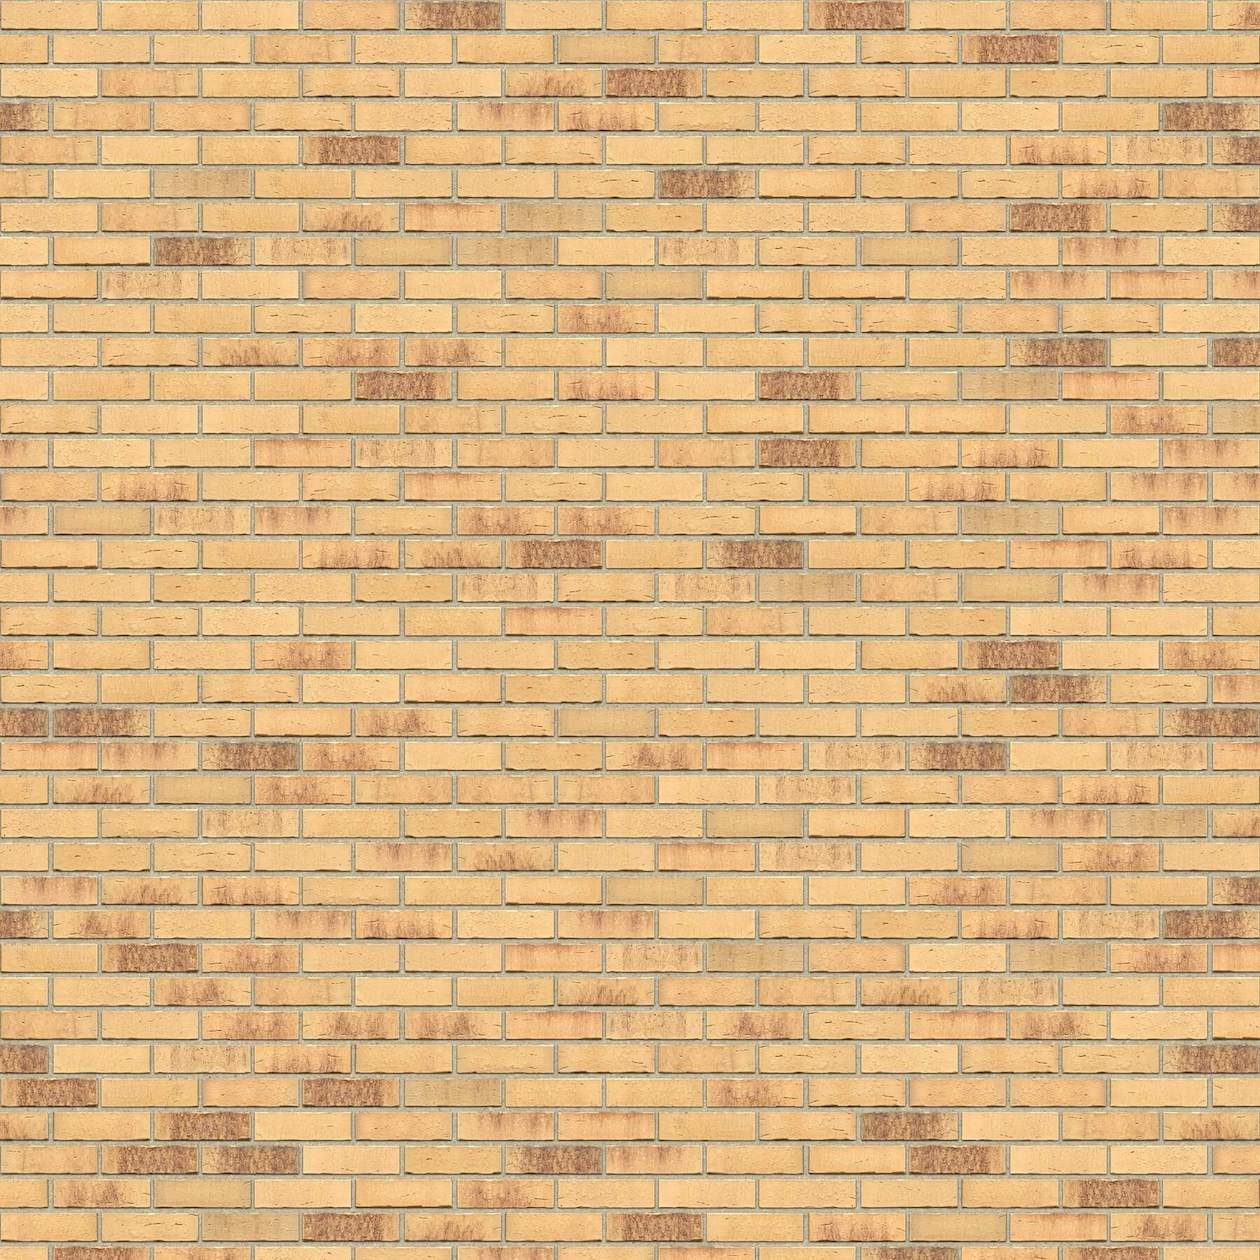 Puna-cigla-FeldHaus-Klinker-brick-house-nf-k-734-Bez Fuga